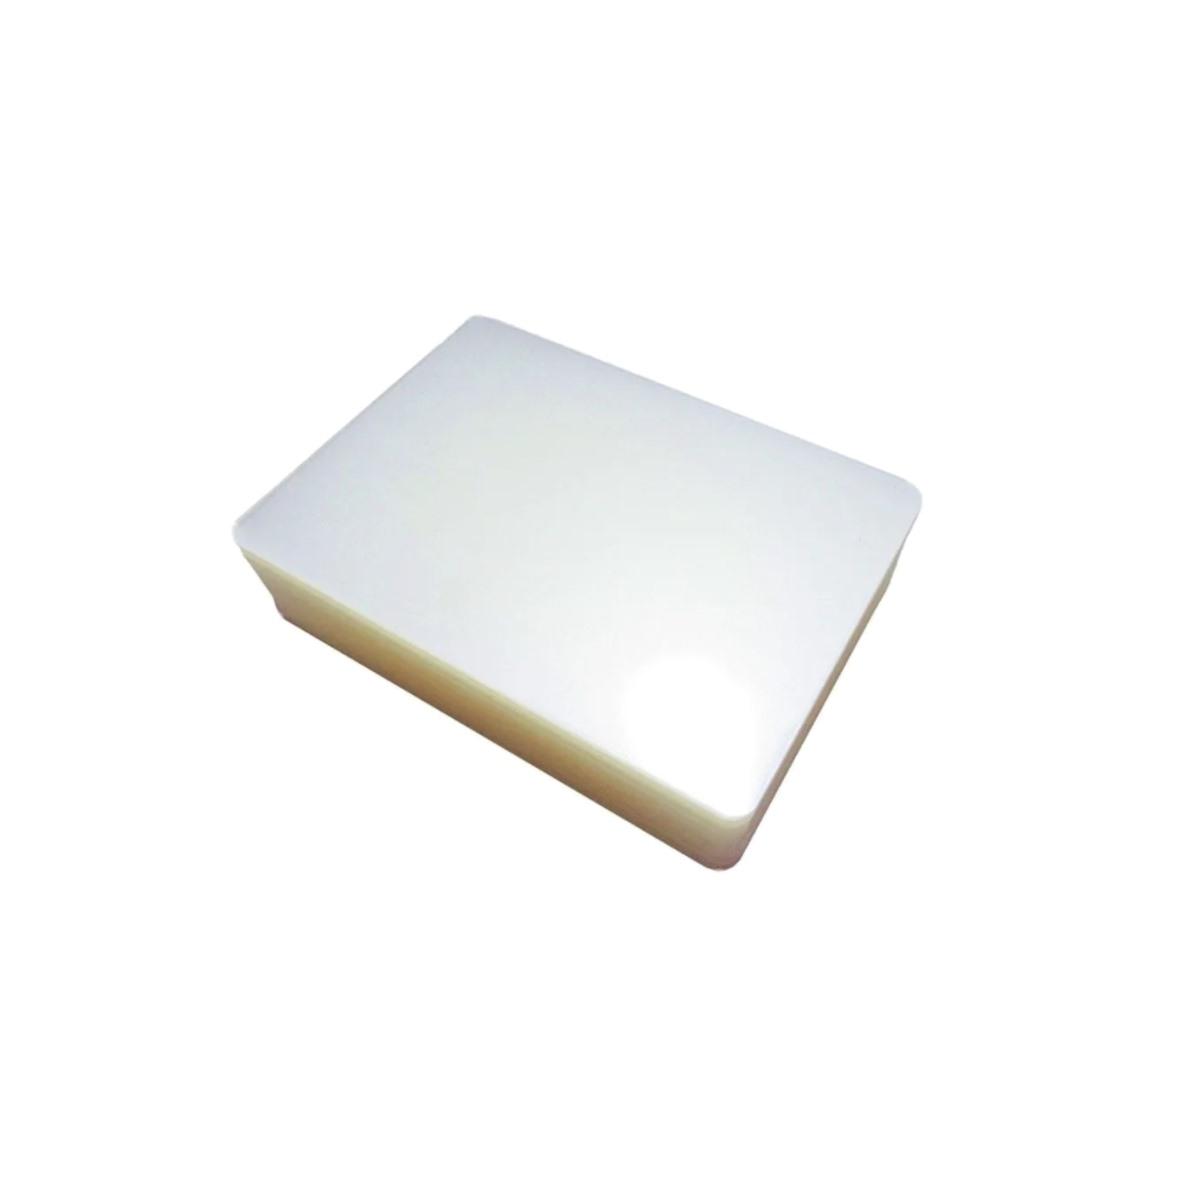 Polaseal plástico para plastificação Crachá 59x86 0,10mm 100un